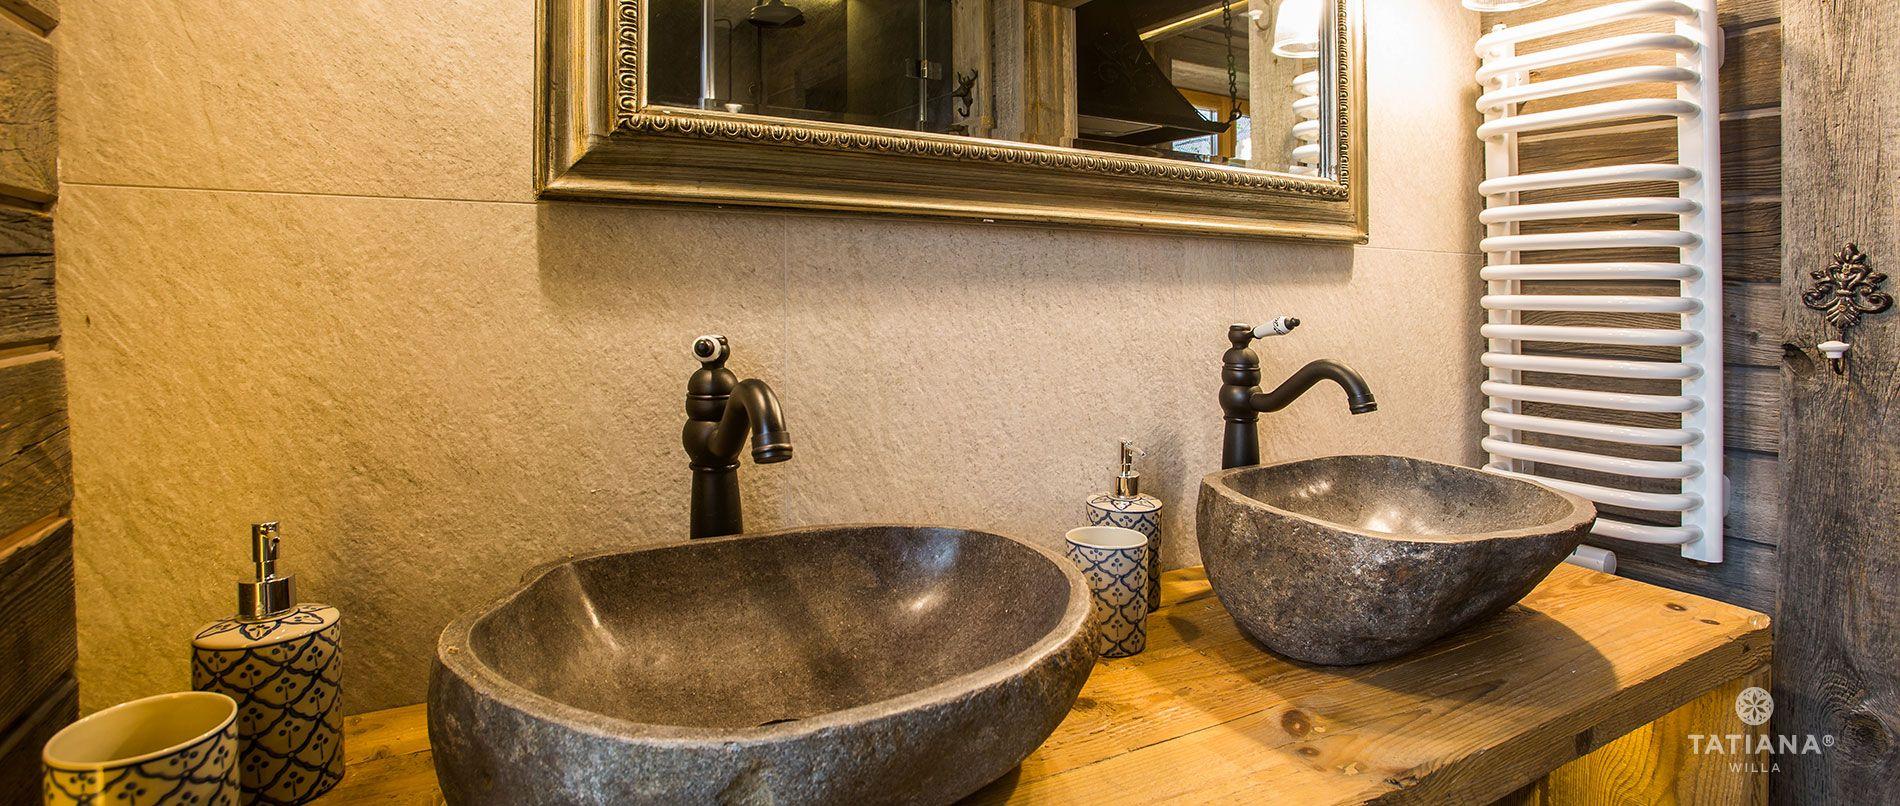 Apartament Syberyjski - łazienka2